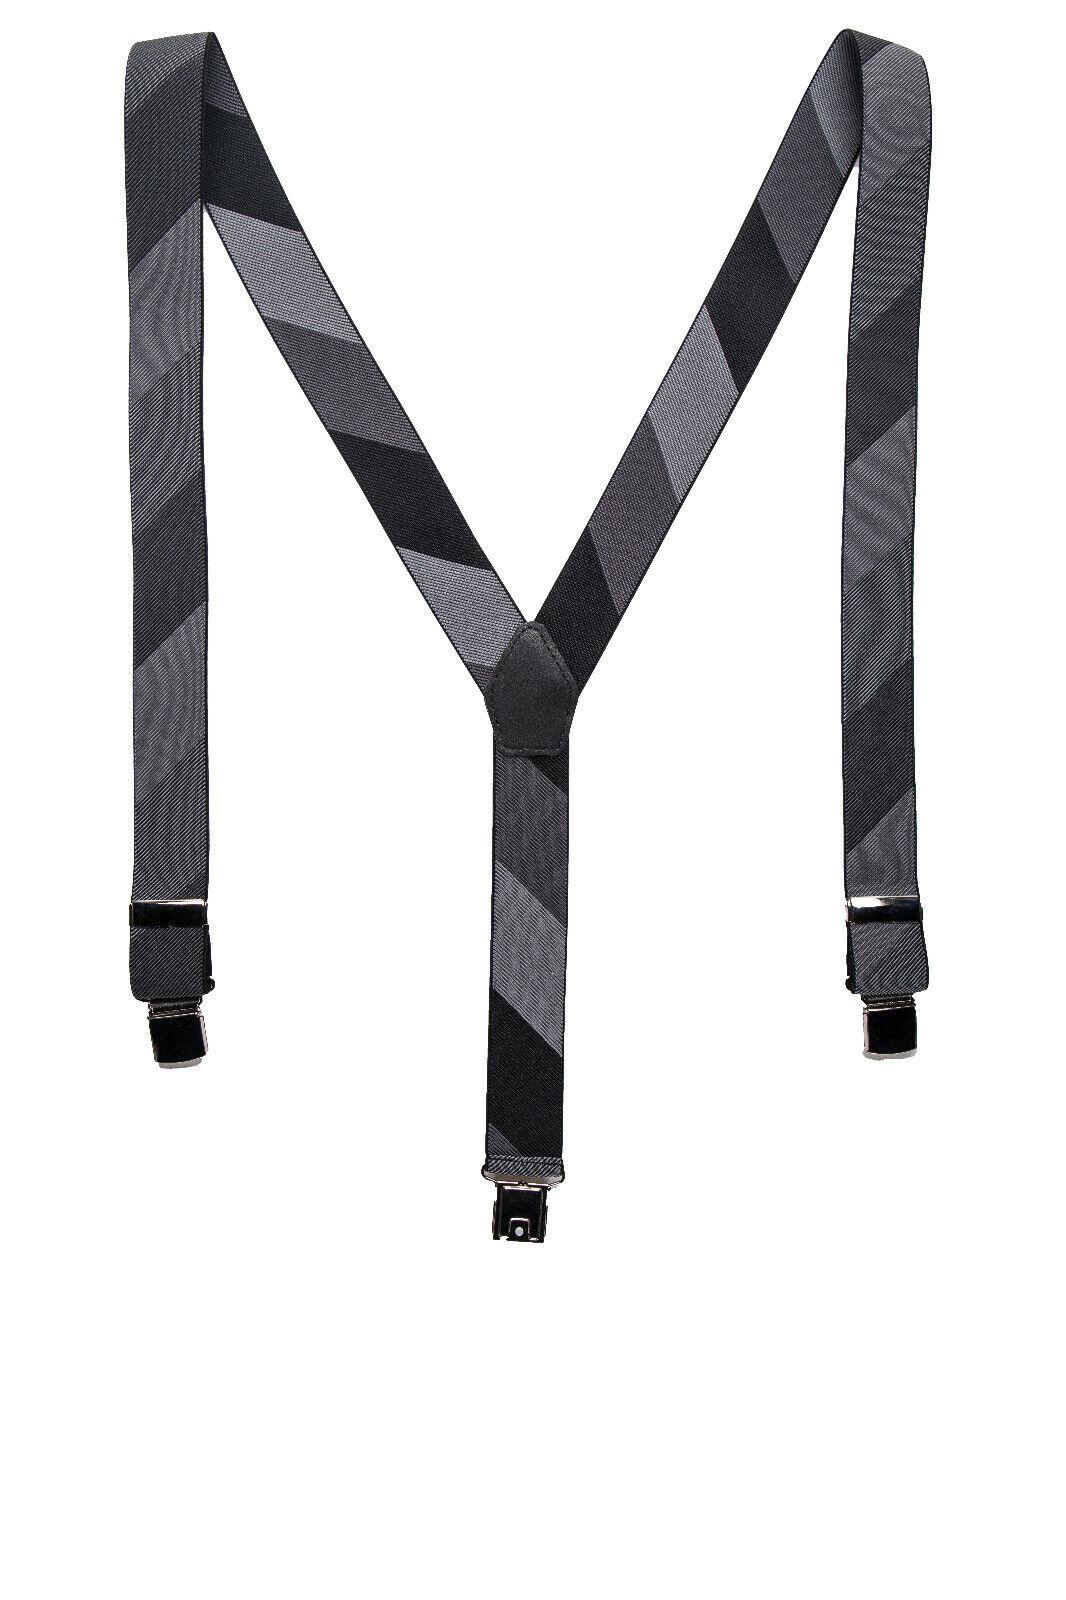 Clip Fashion Dress Vegan Brace Suspender Greyscaled Elastic Lycra & Adjustable